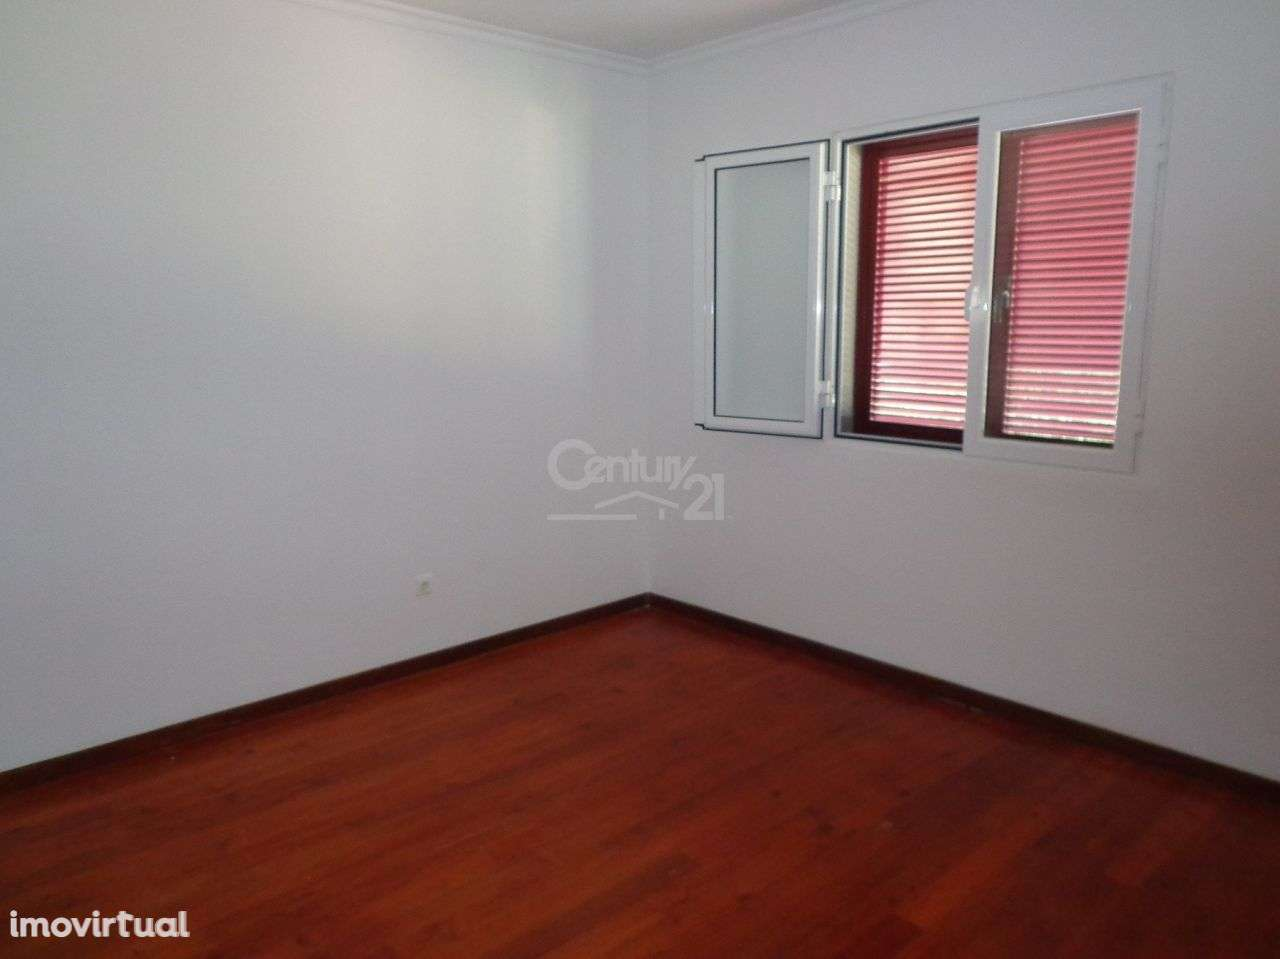 Apartamento para comprar, Santa Cruz - Foto 8